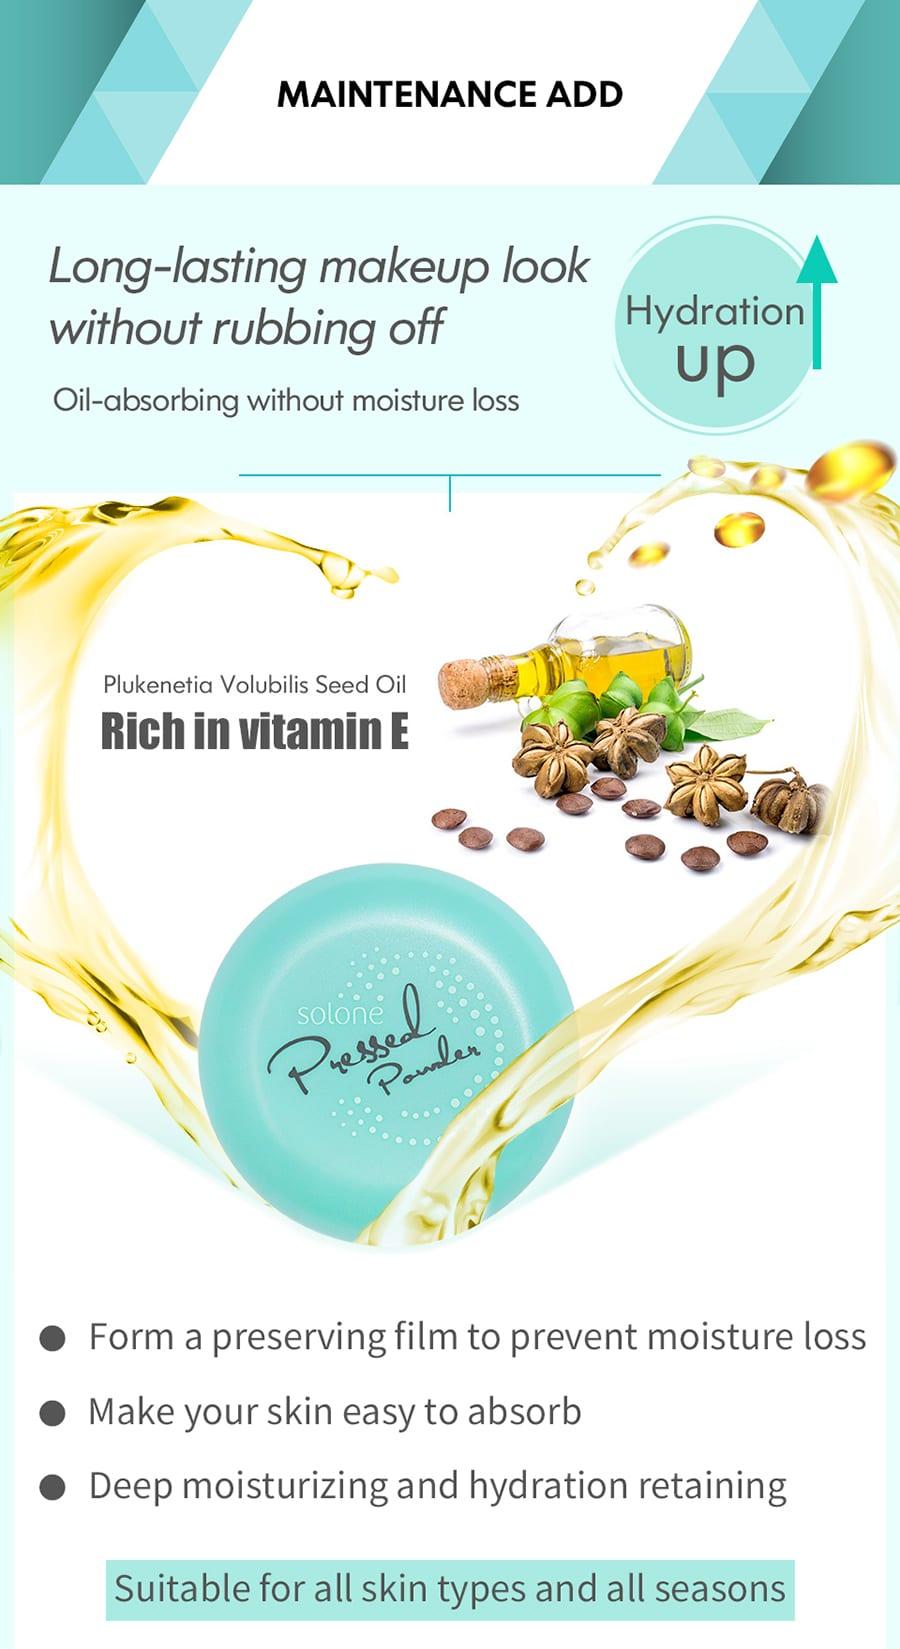 Shine Free Pressed Powder - Product Info 03